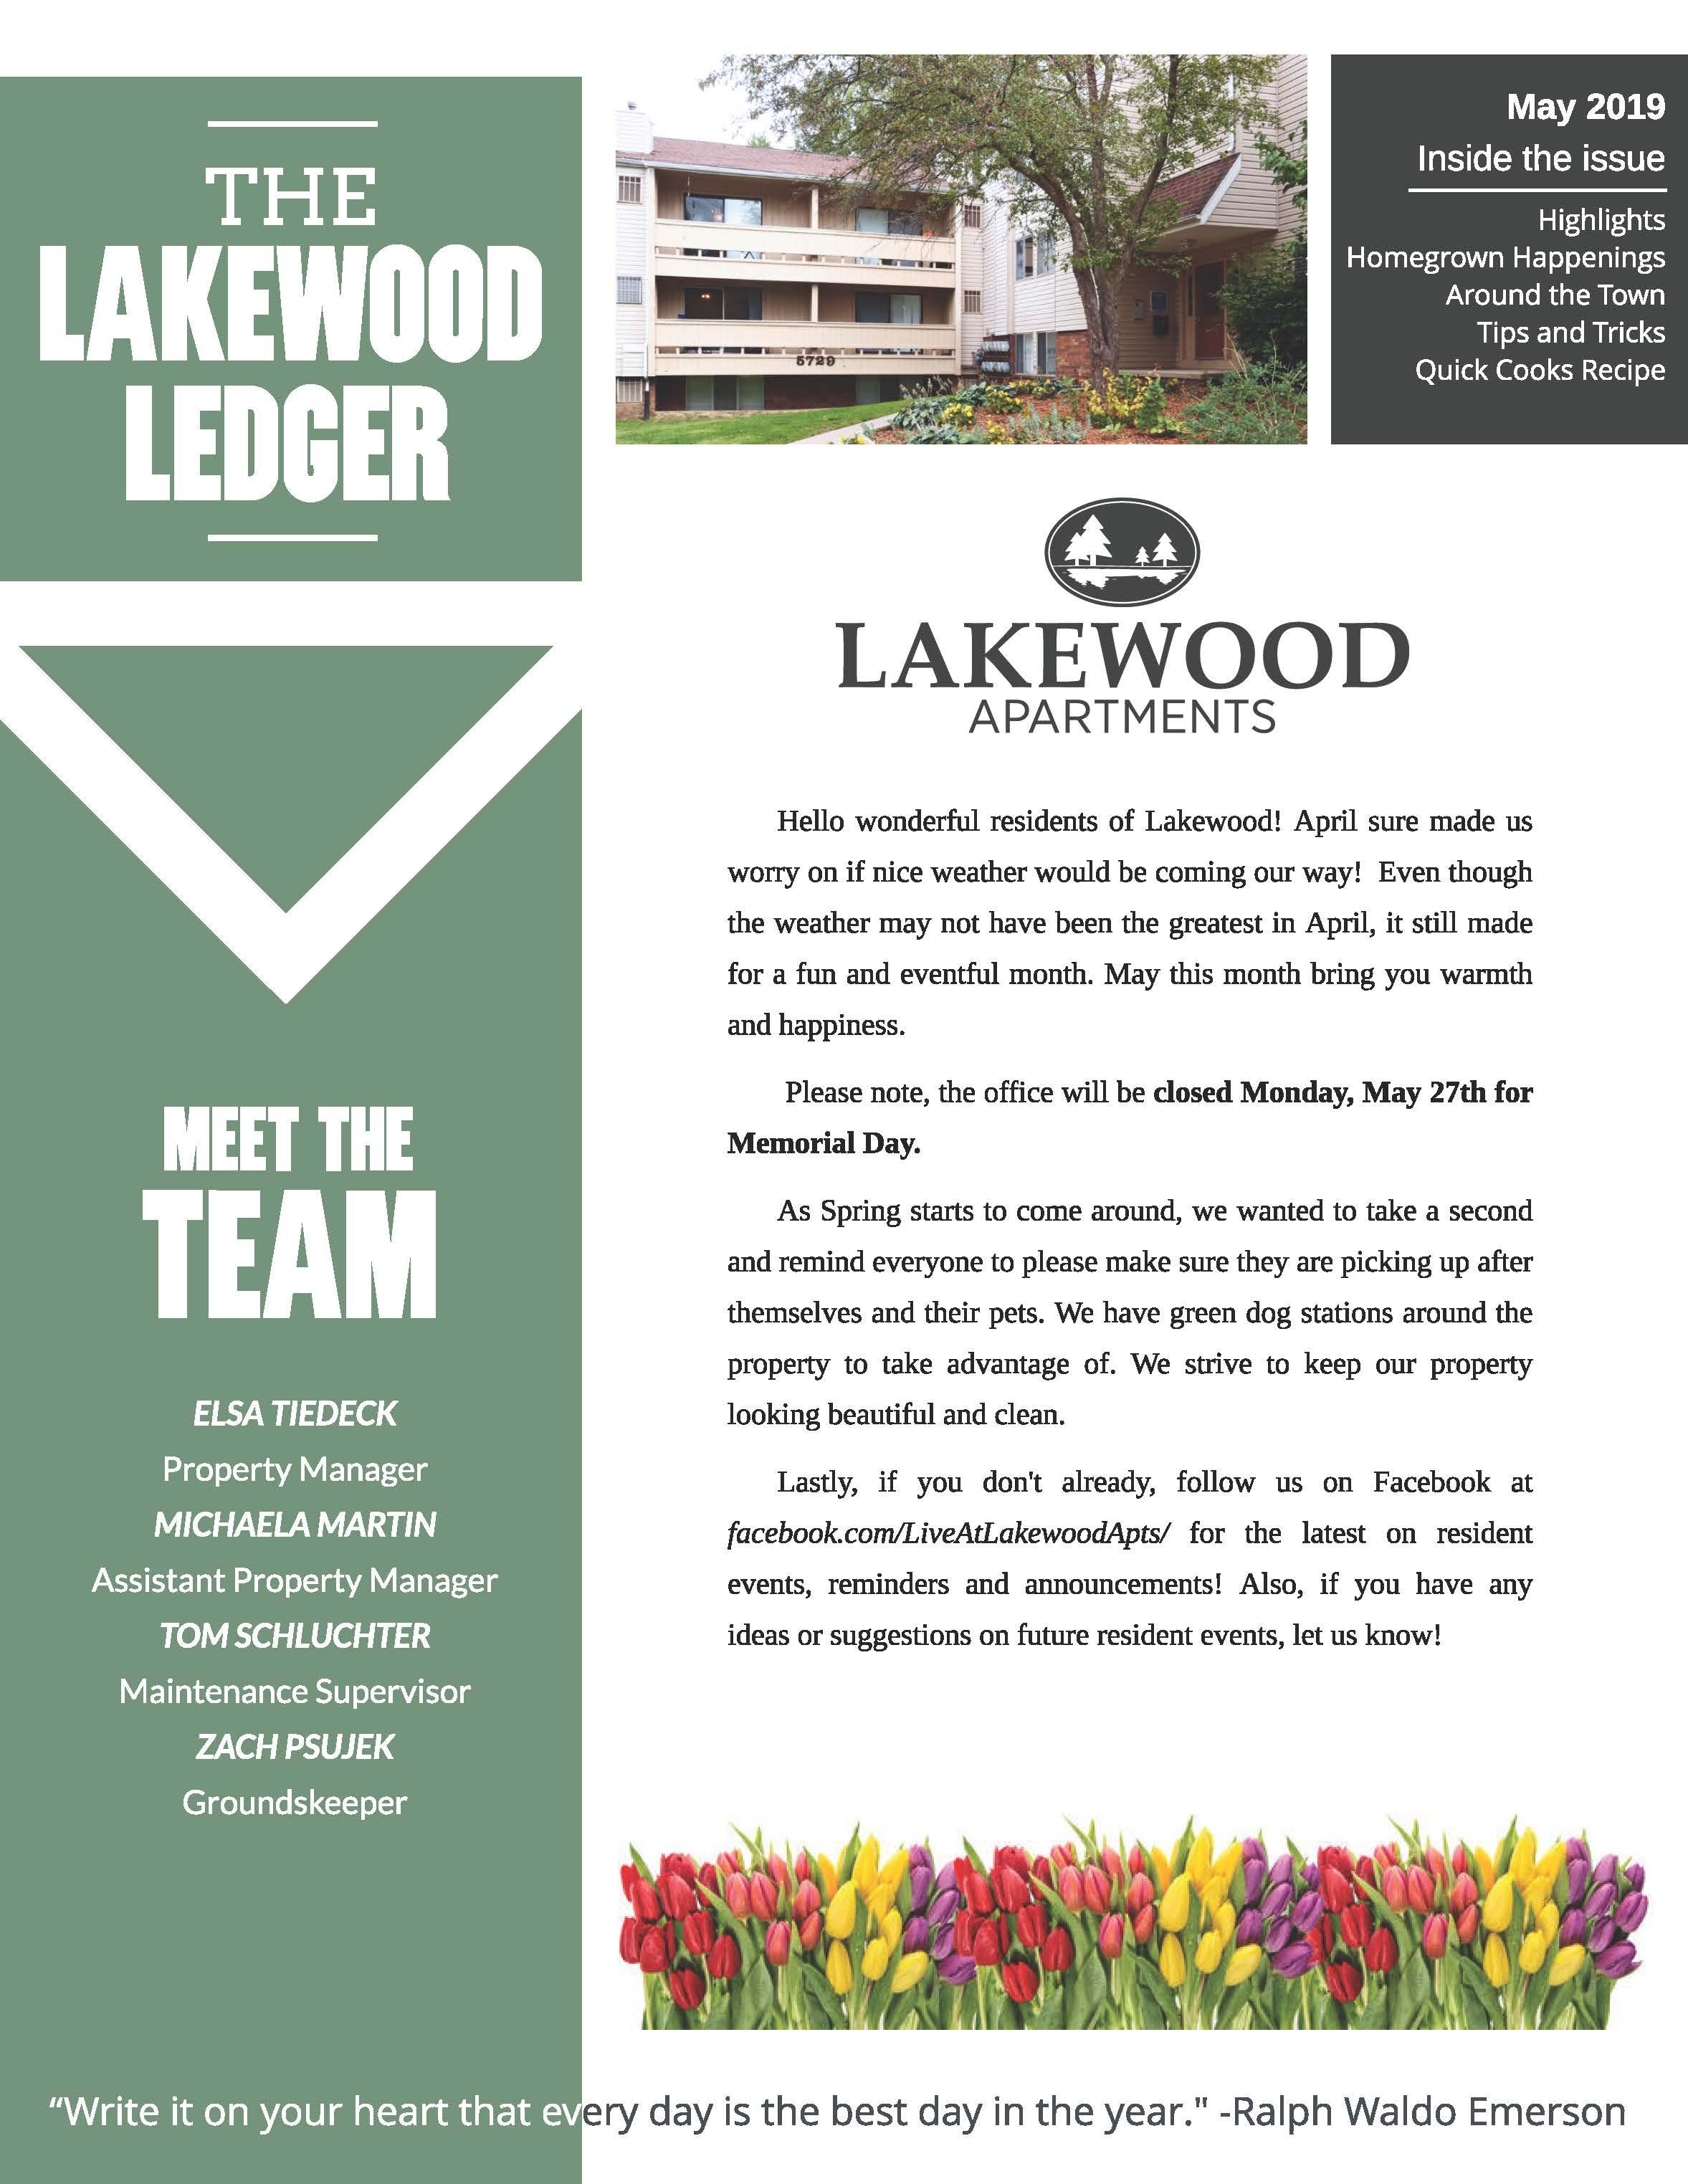 May 2019 Newsletter The Lakewood Ledger